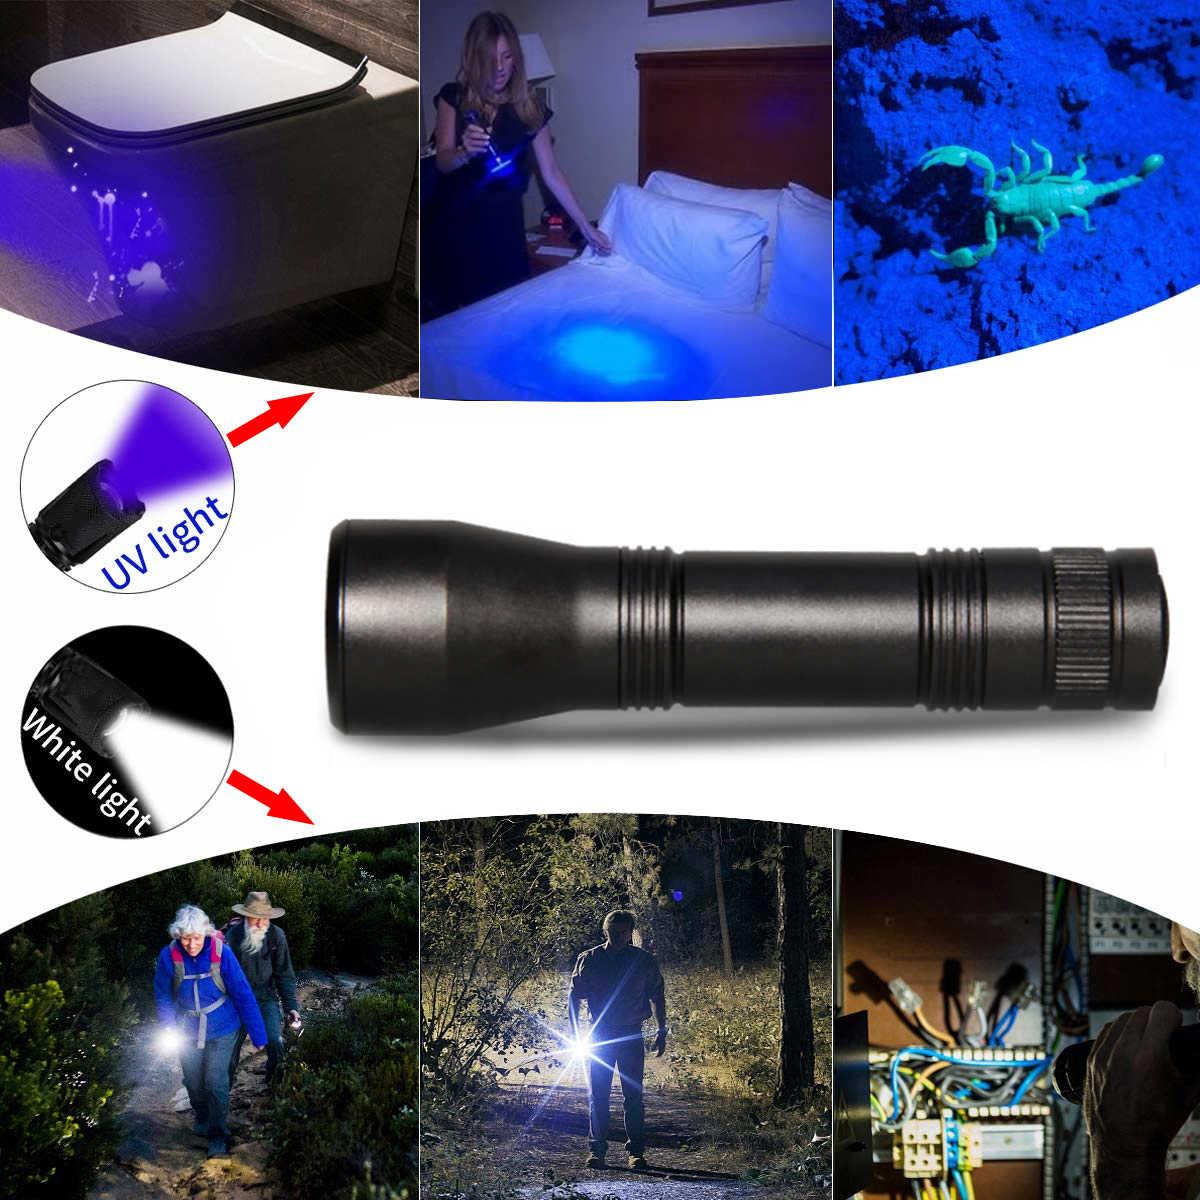 8000 Lums LED UV פנס UV אור L2/T6 לבן אור LED לפיד אור 5 מצב Zoomable 395nm Blacklight על ידי 18650 סוללה